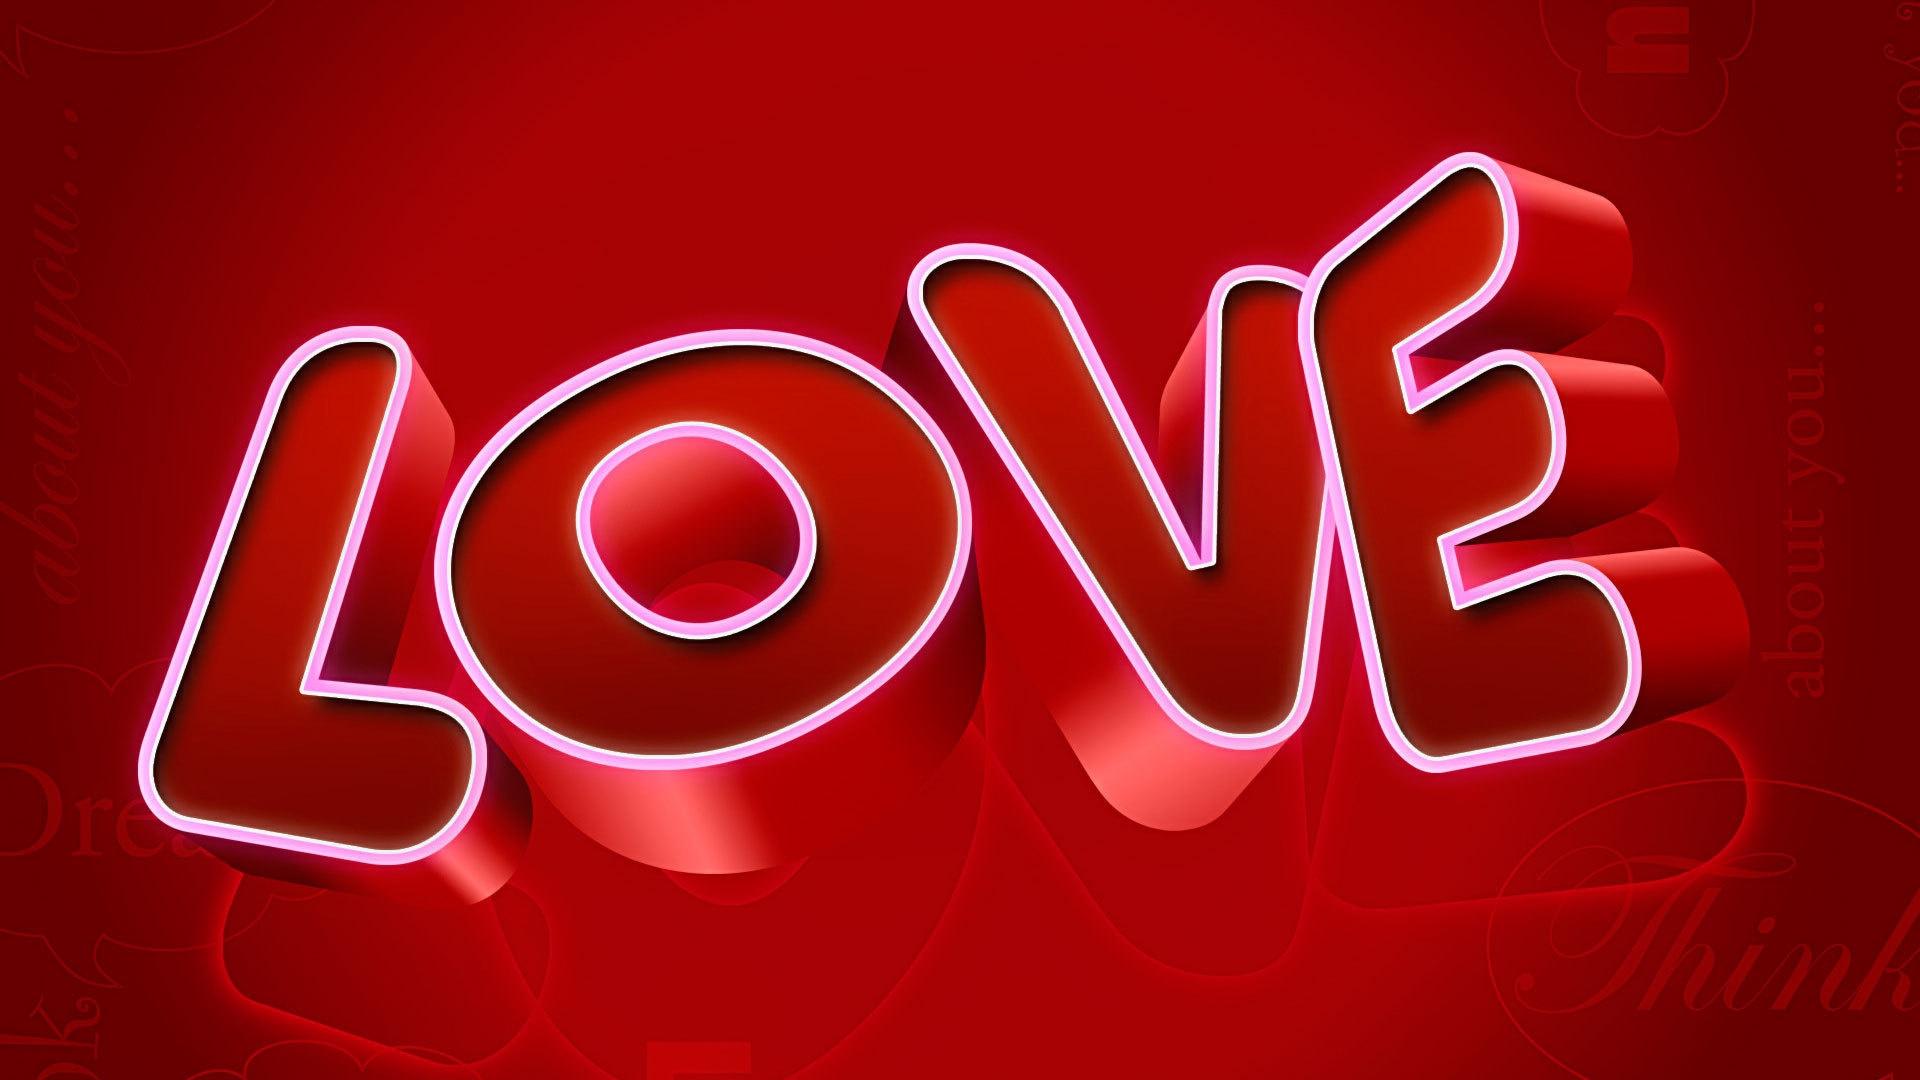 love, надпись, любовь